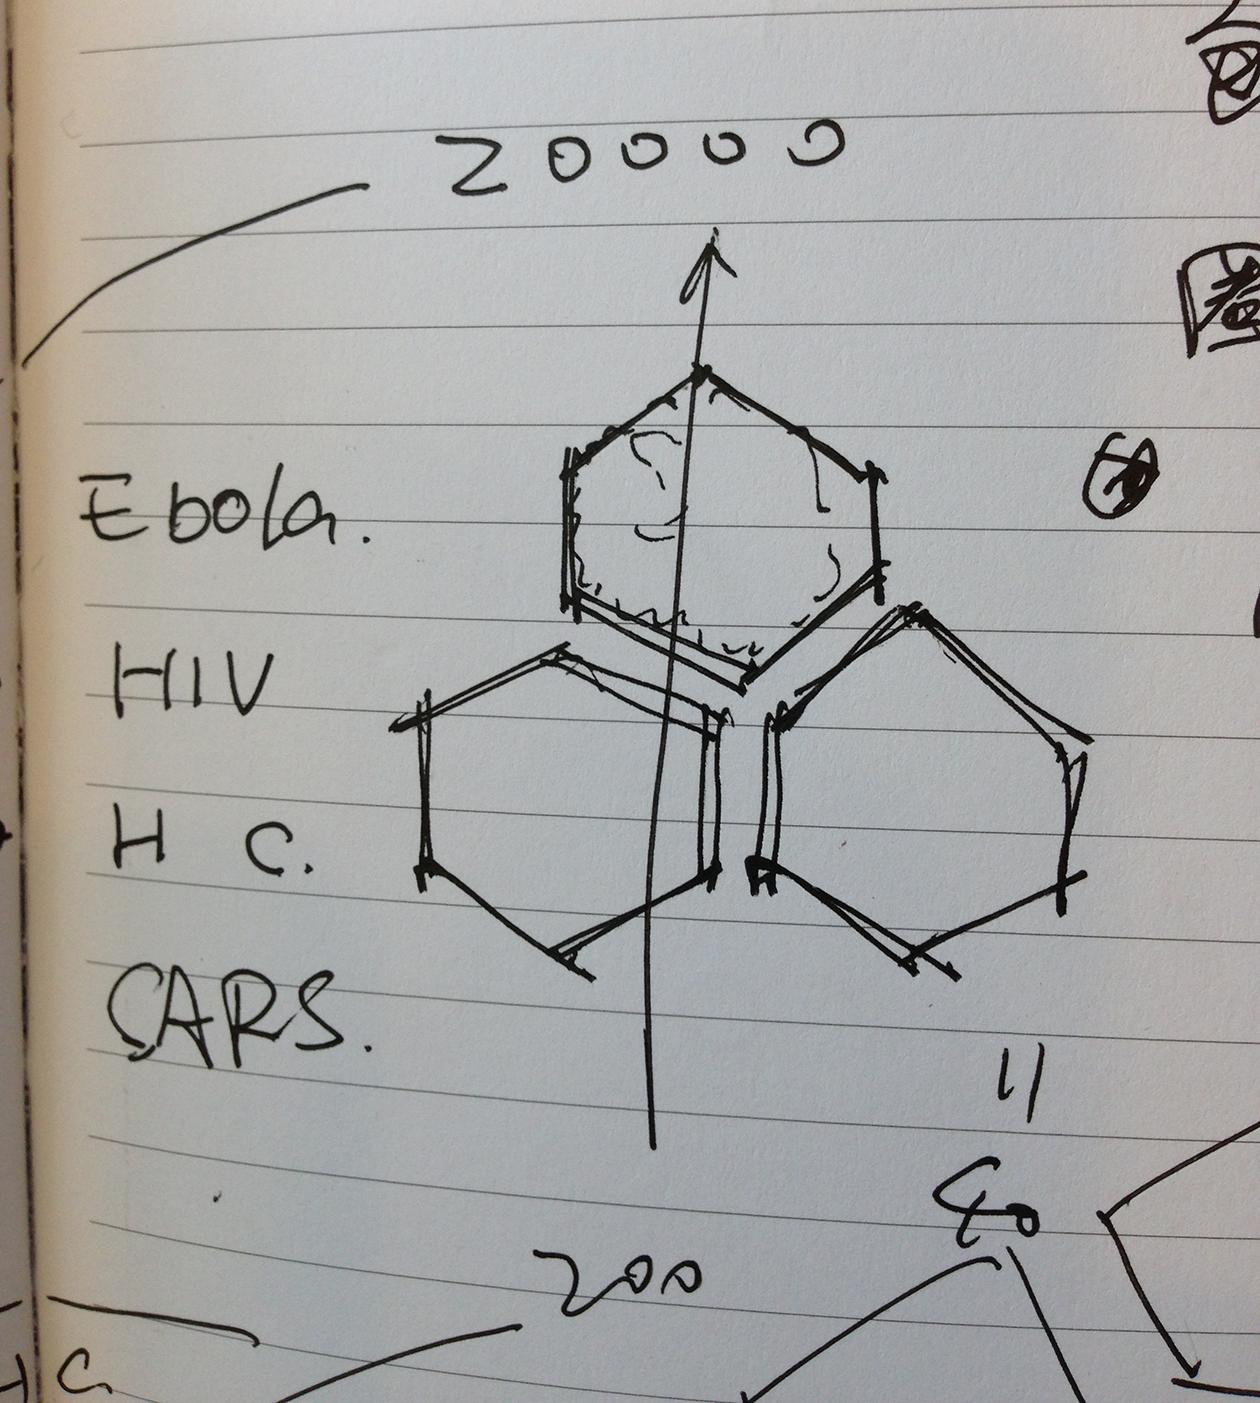 ebola-hiv